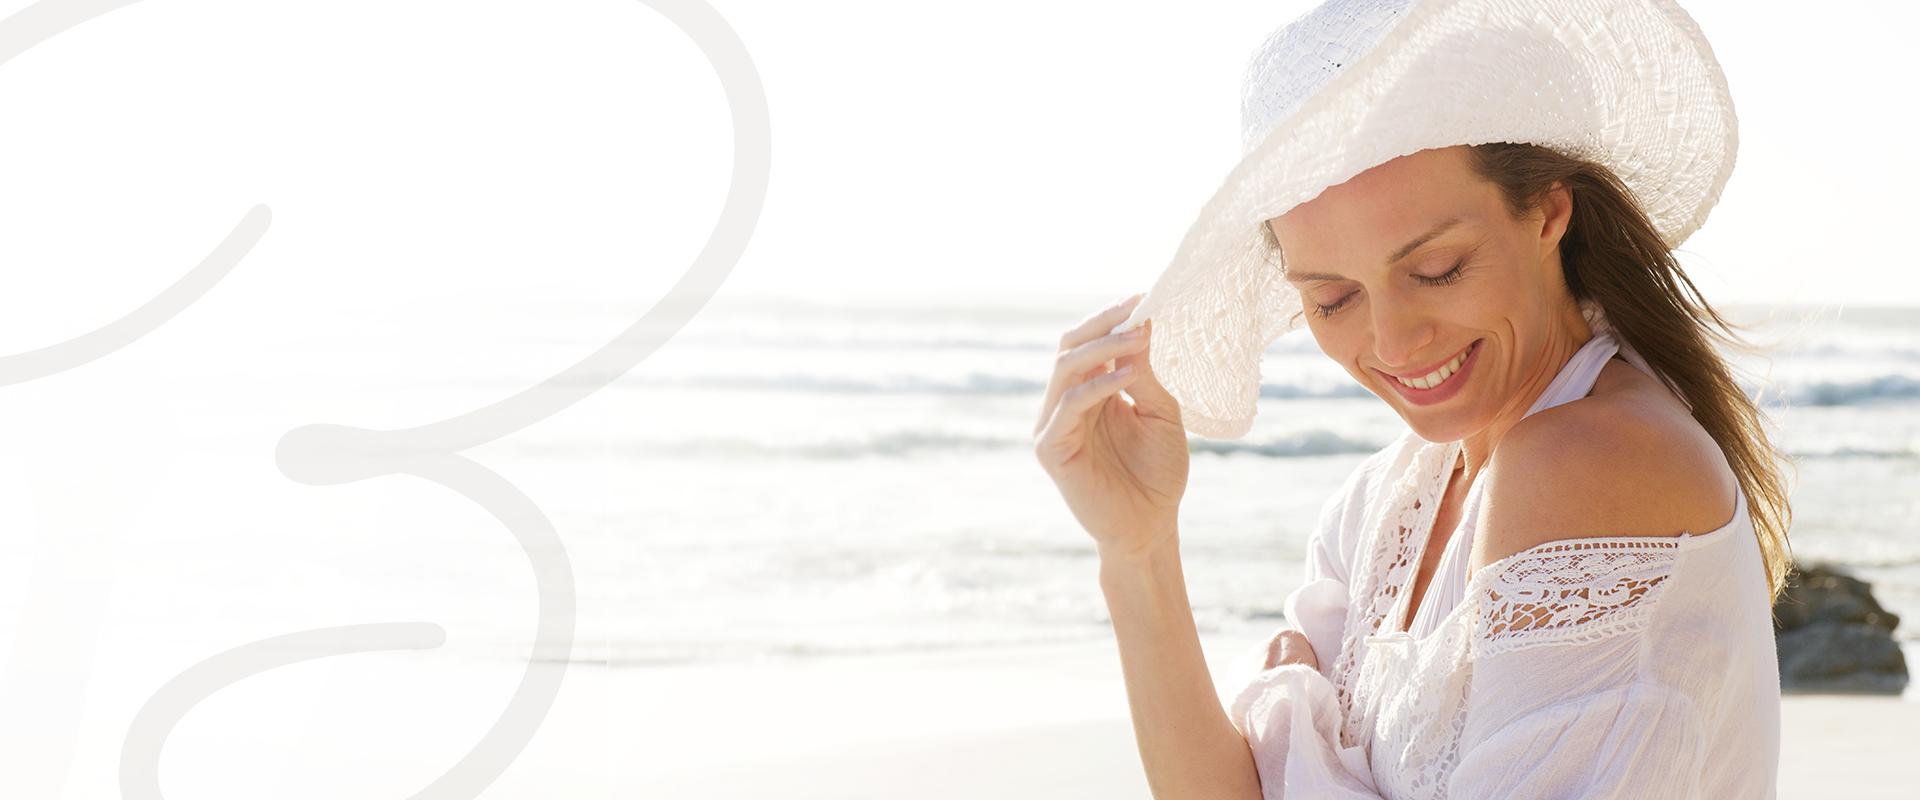 Beautiful woman / med spa customer at the beach happy to have chosen Bellamedica in Kirkland, WA